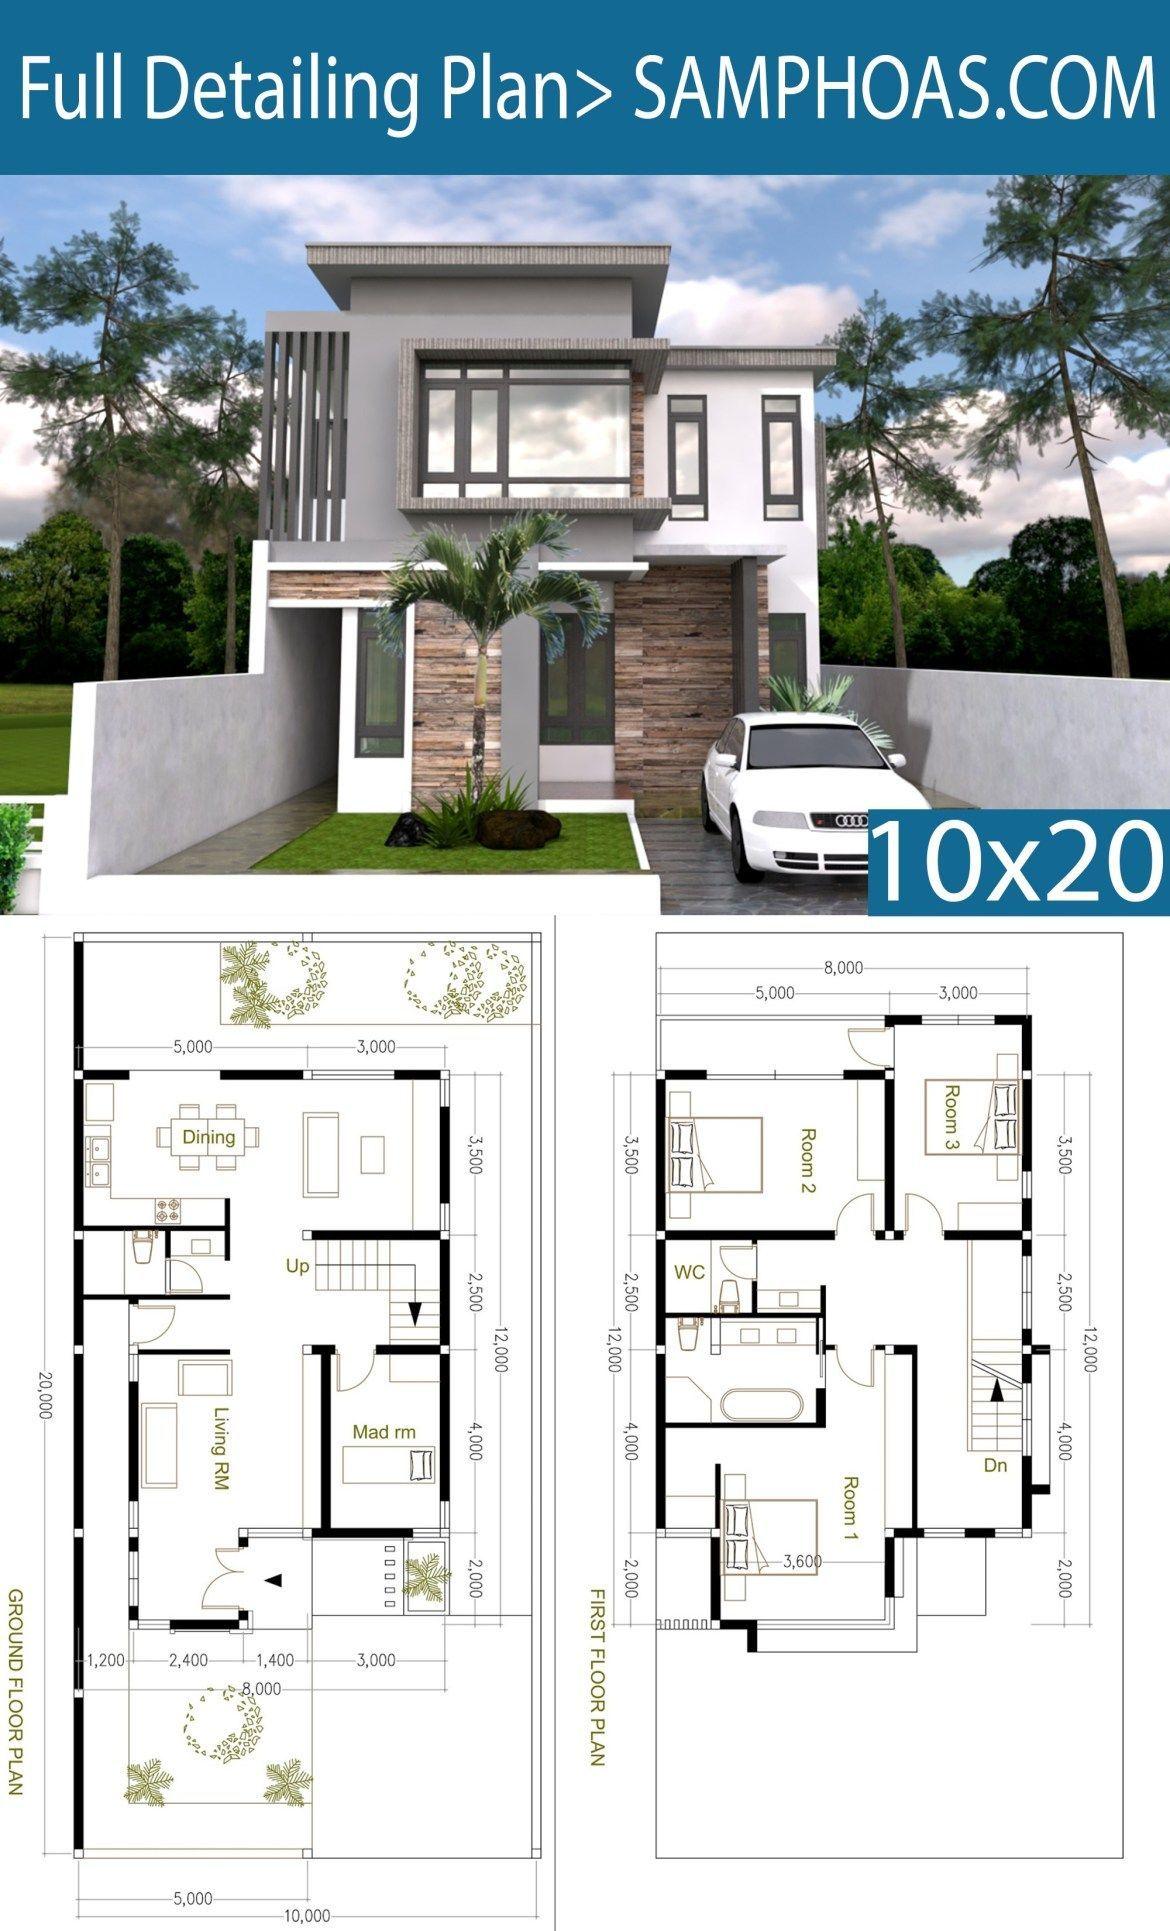 4 Bedroom Modern Home Plan Size 8x12m Samphoas Plansearch 8x12bedroomideas Modern House Floor Plans Model House Plan Modern House Plans